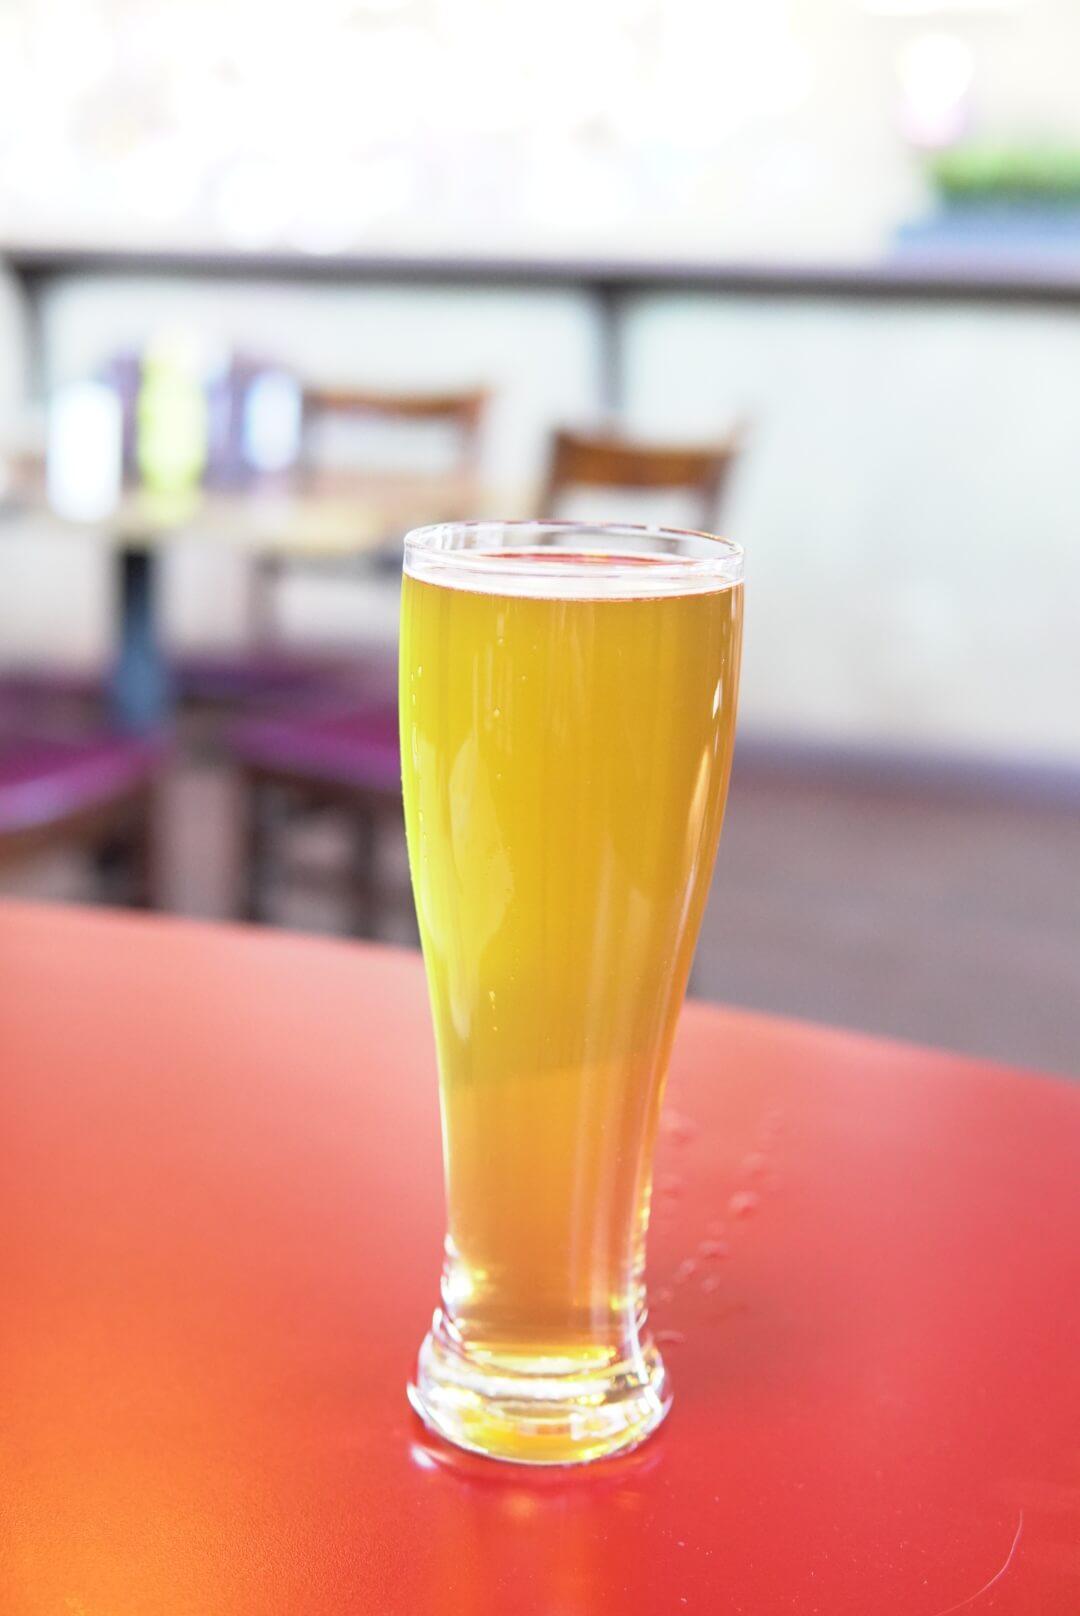 Brewery in Tonopah